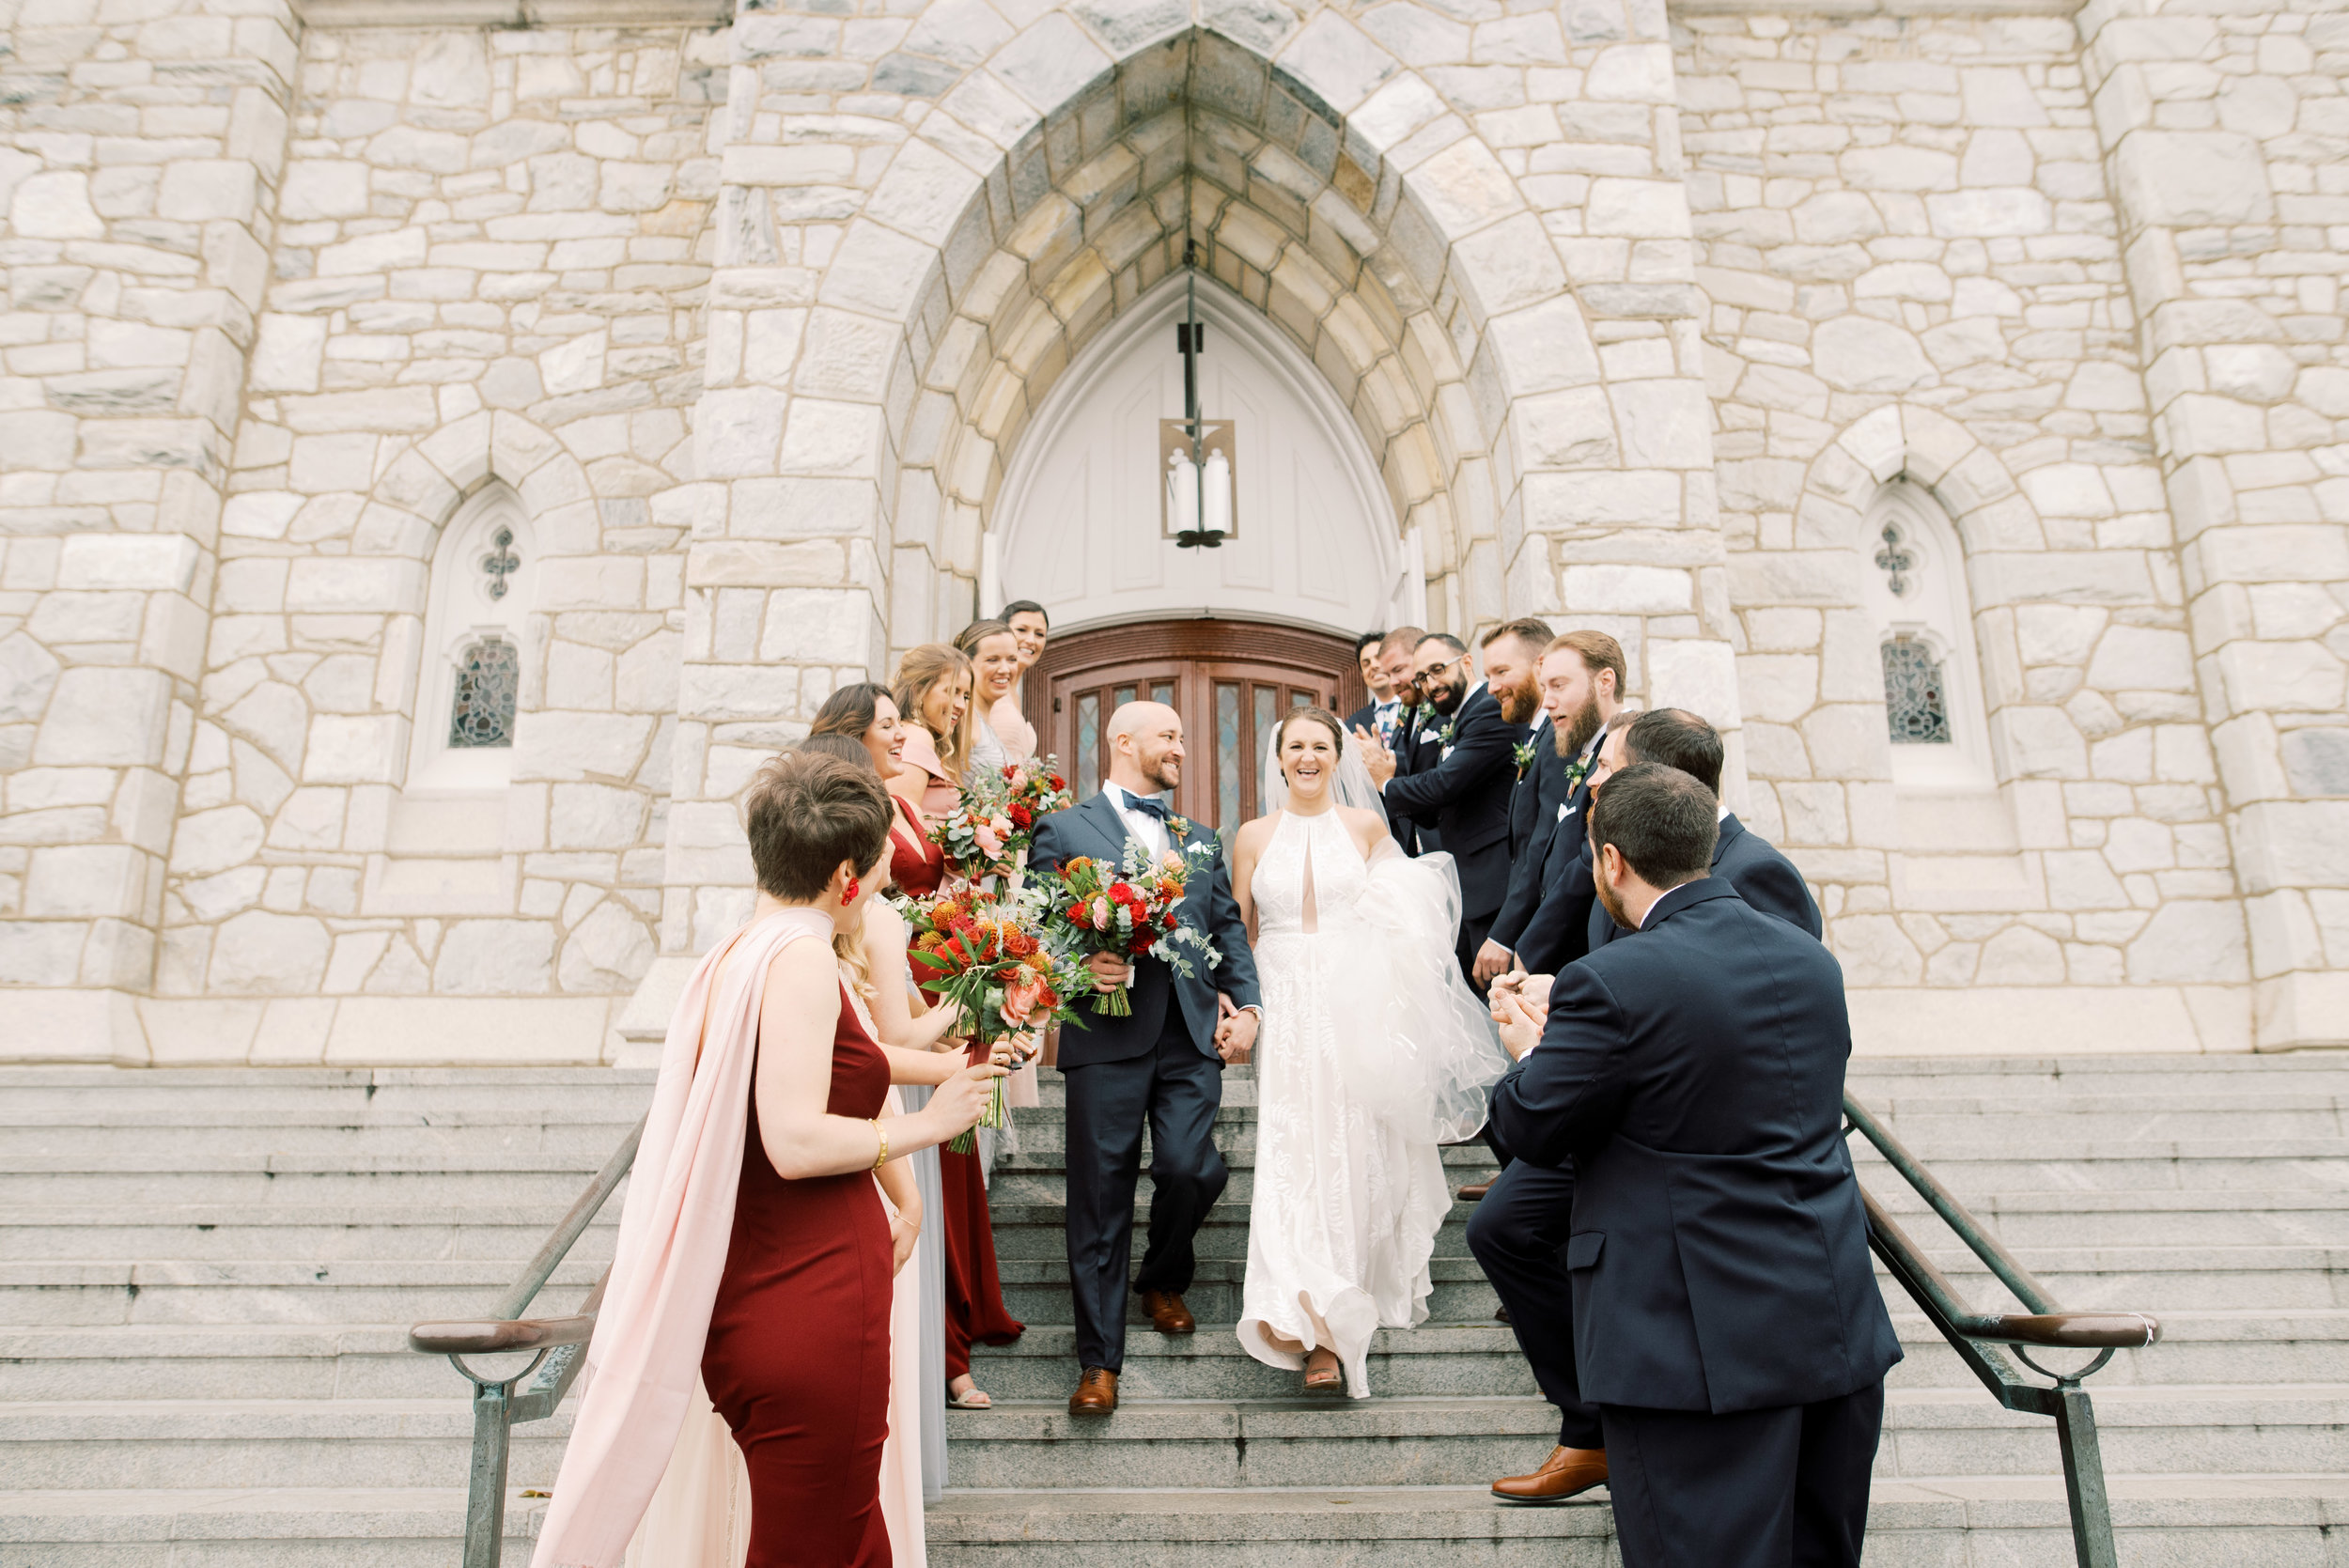 haley-richter-photography-october-pomme-wedding-in-radnor-038.jpg